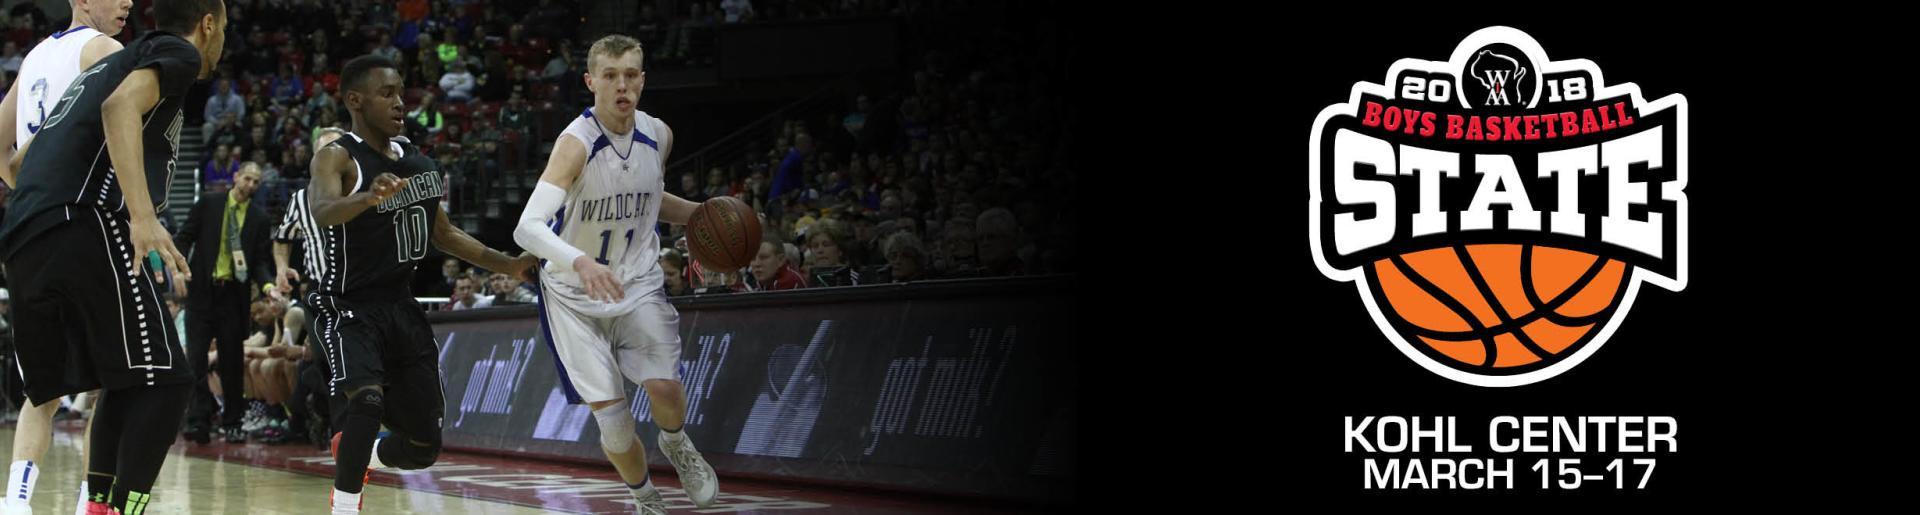 WIAA Basketball 2018